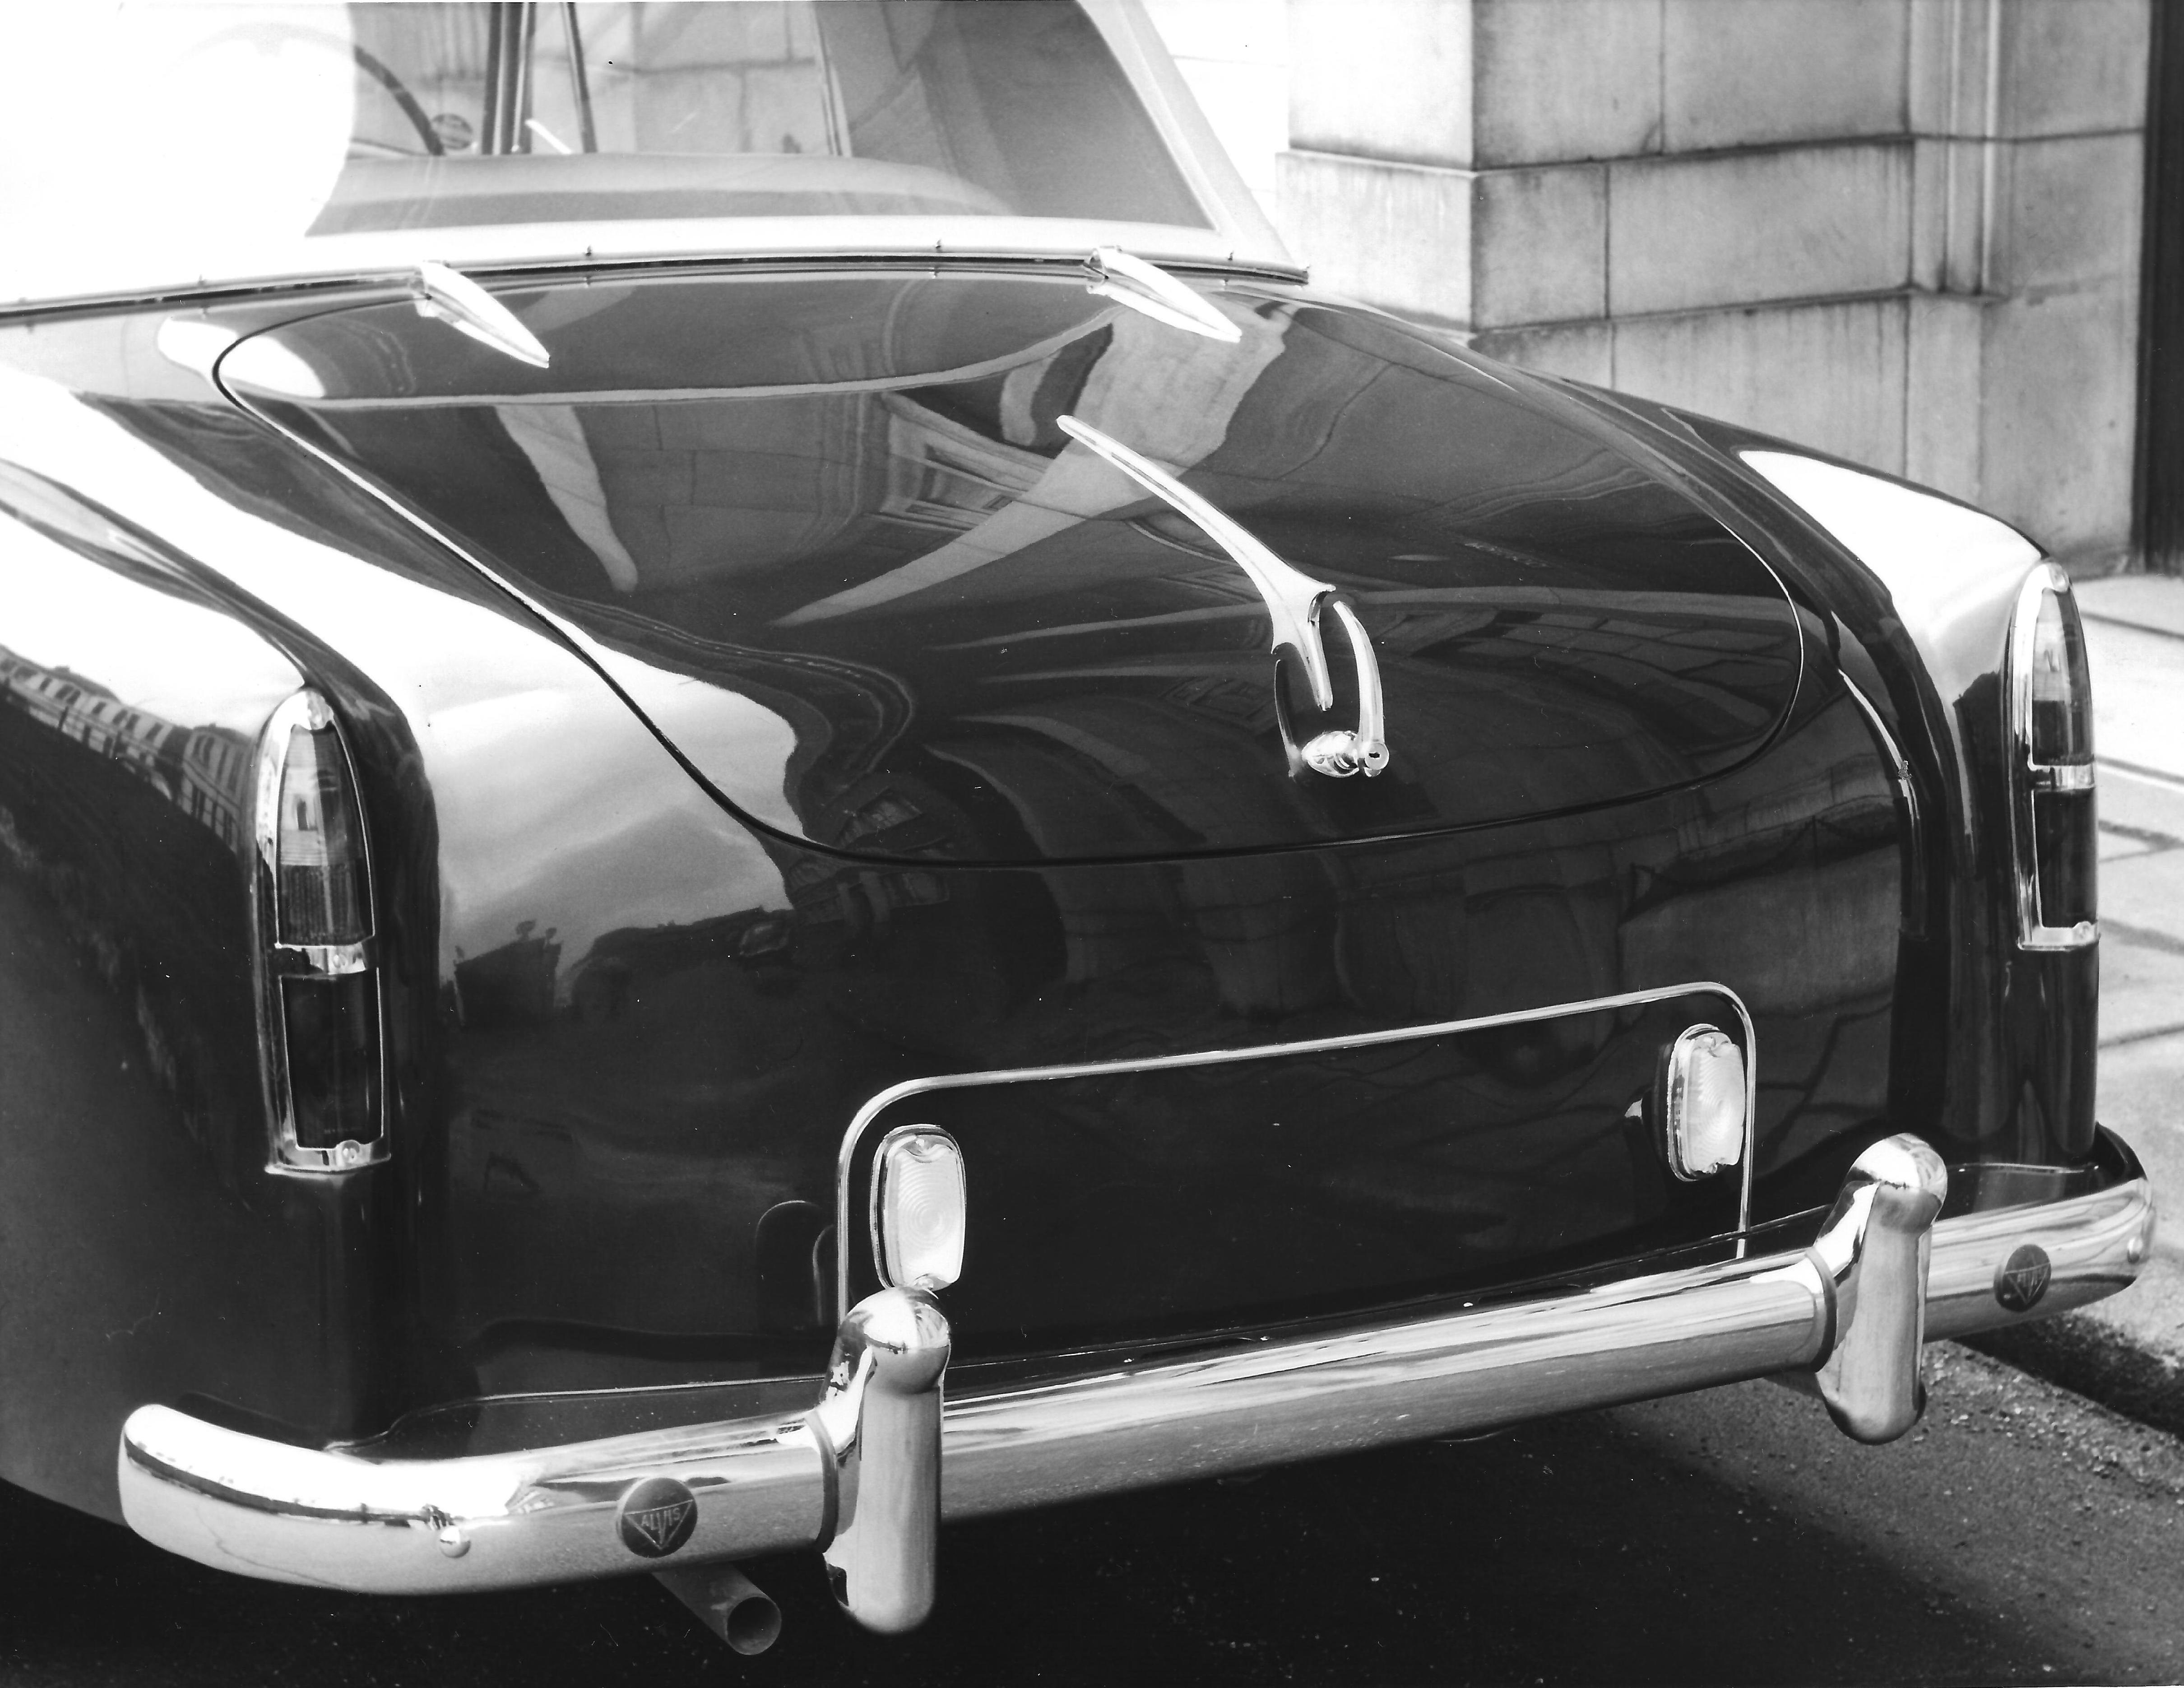 The standard rear lights on a Series II TD21